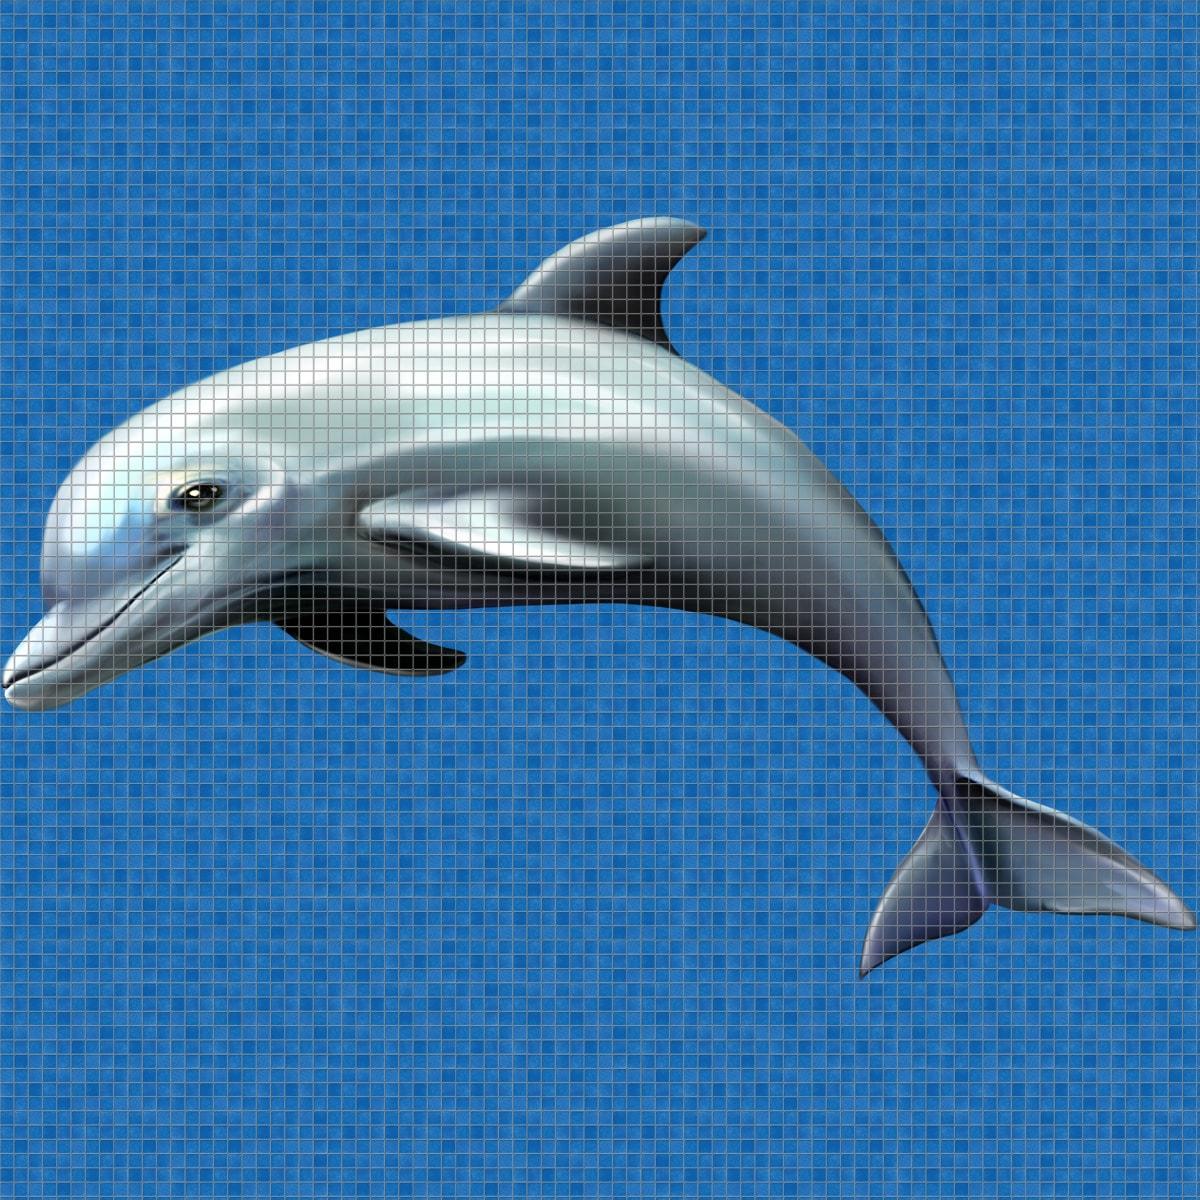 Dolphin-Digital_Print-Mosaic-Ezarri.jpg